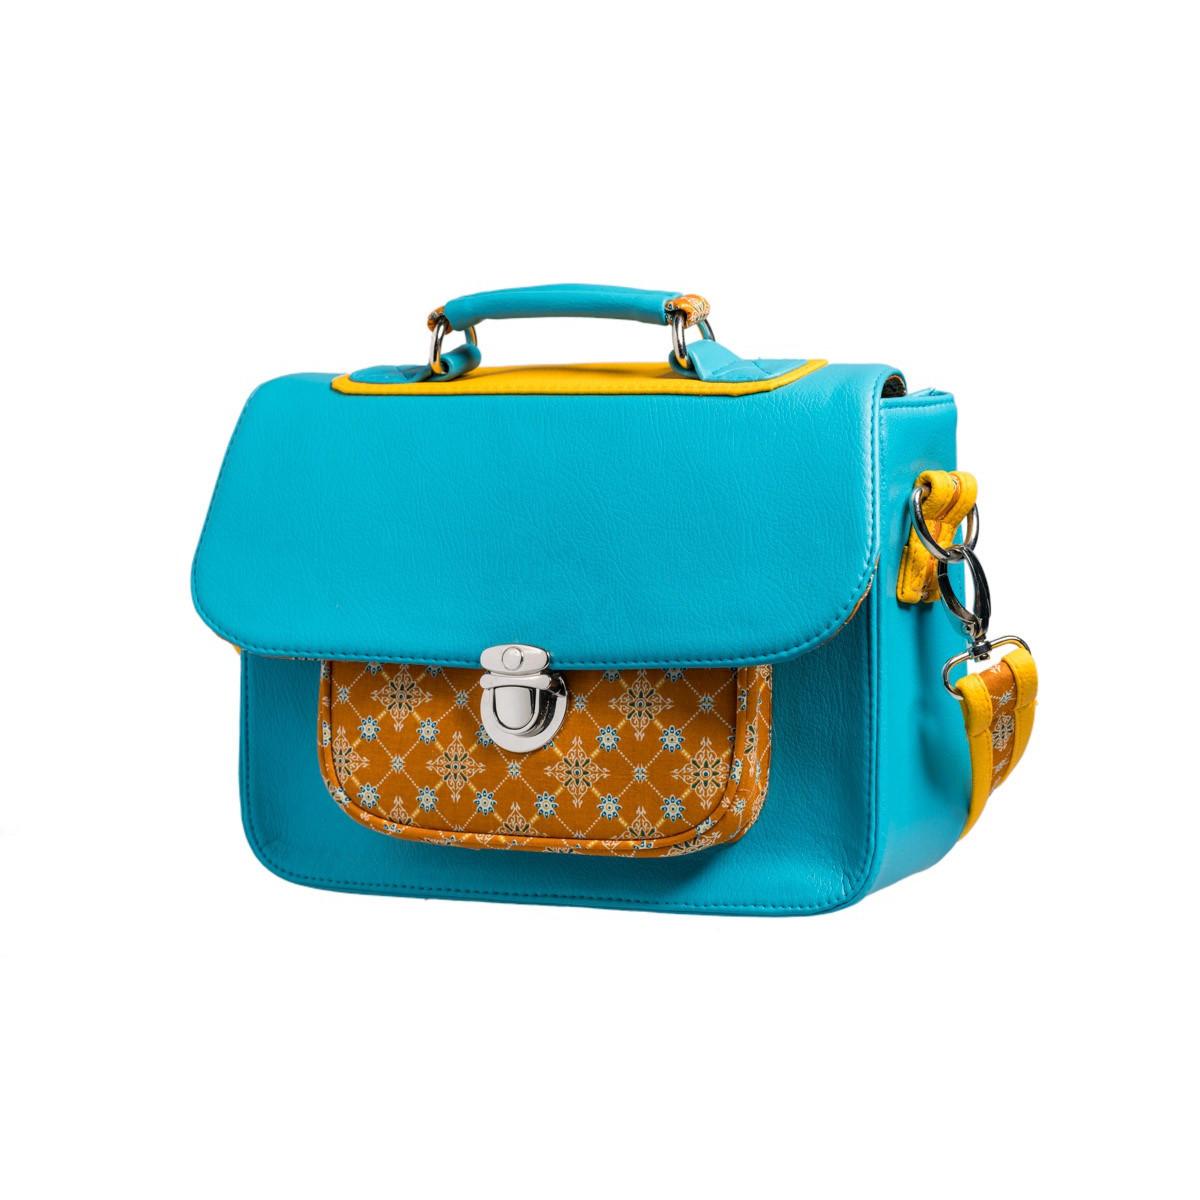 Sac-a-main-femme-style-cartable-turquoise-et-ocre-jaune